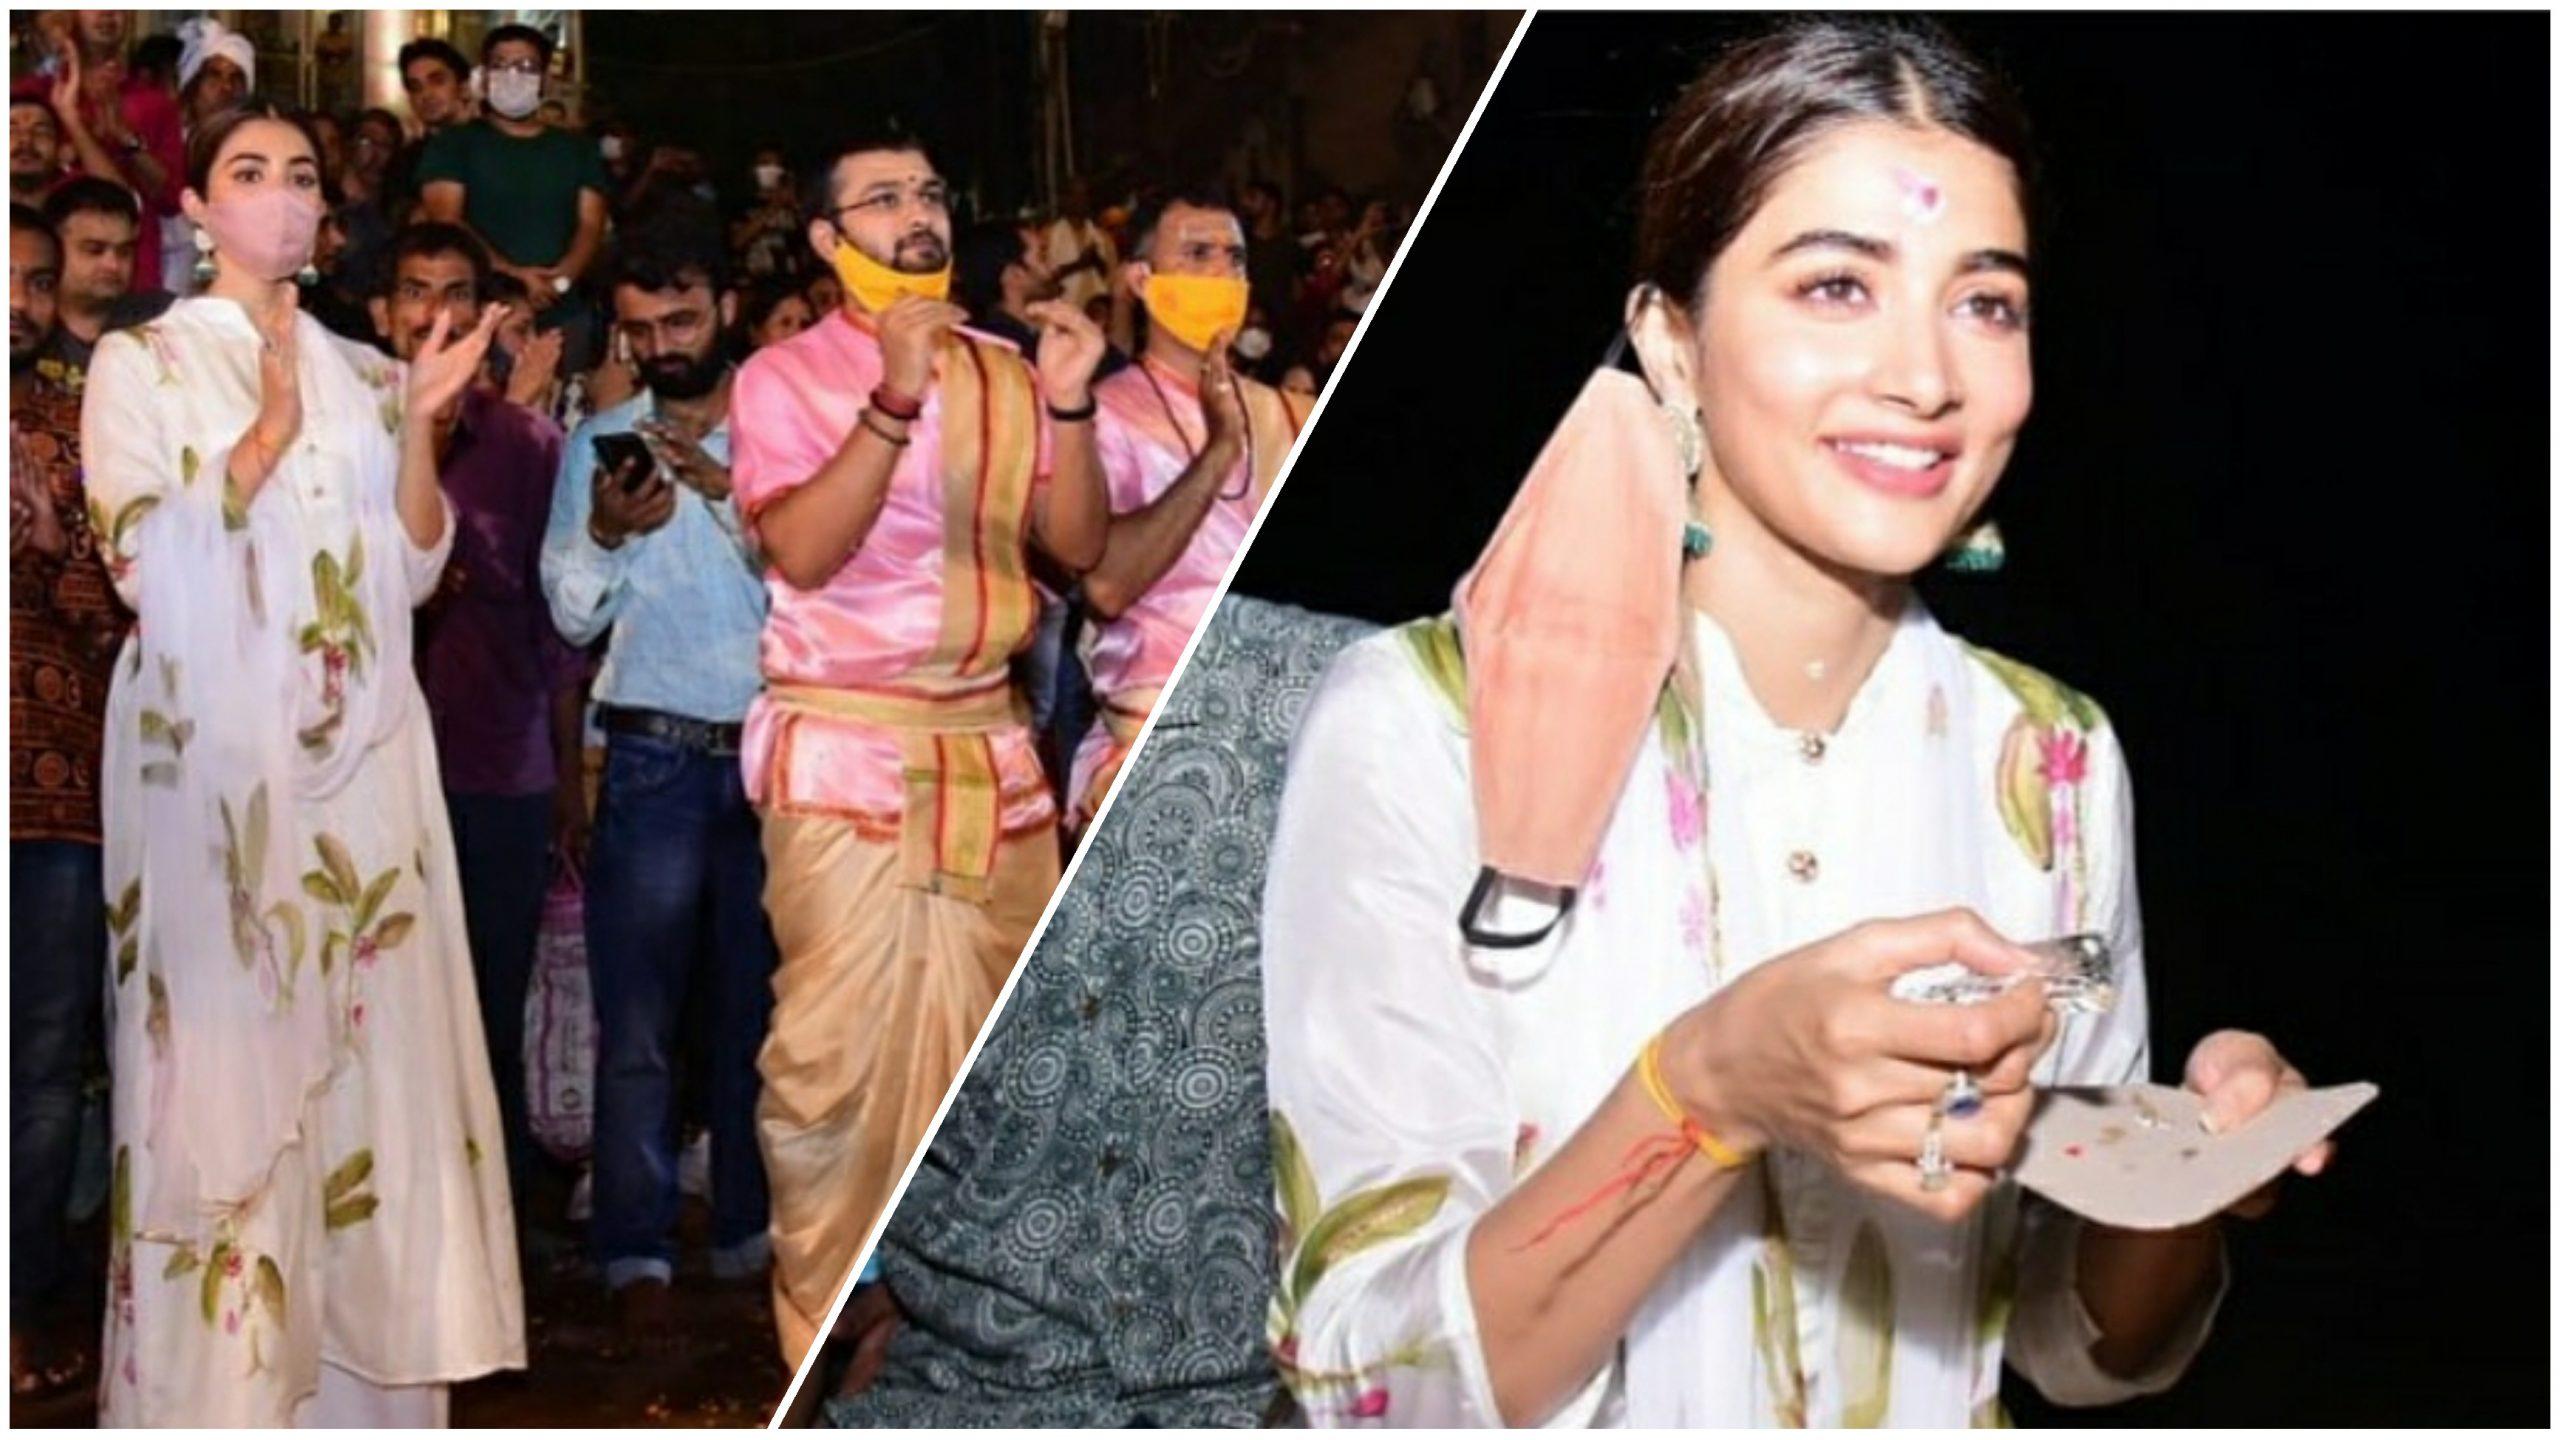 Pooja Hegde seeks blessings in Varanasi for her upcoming projects